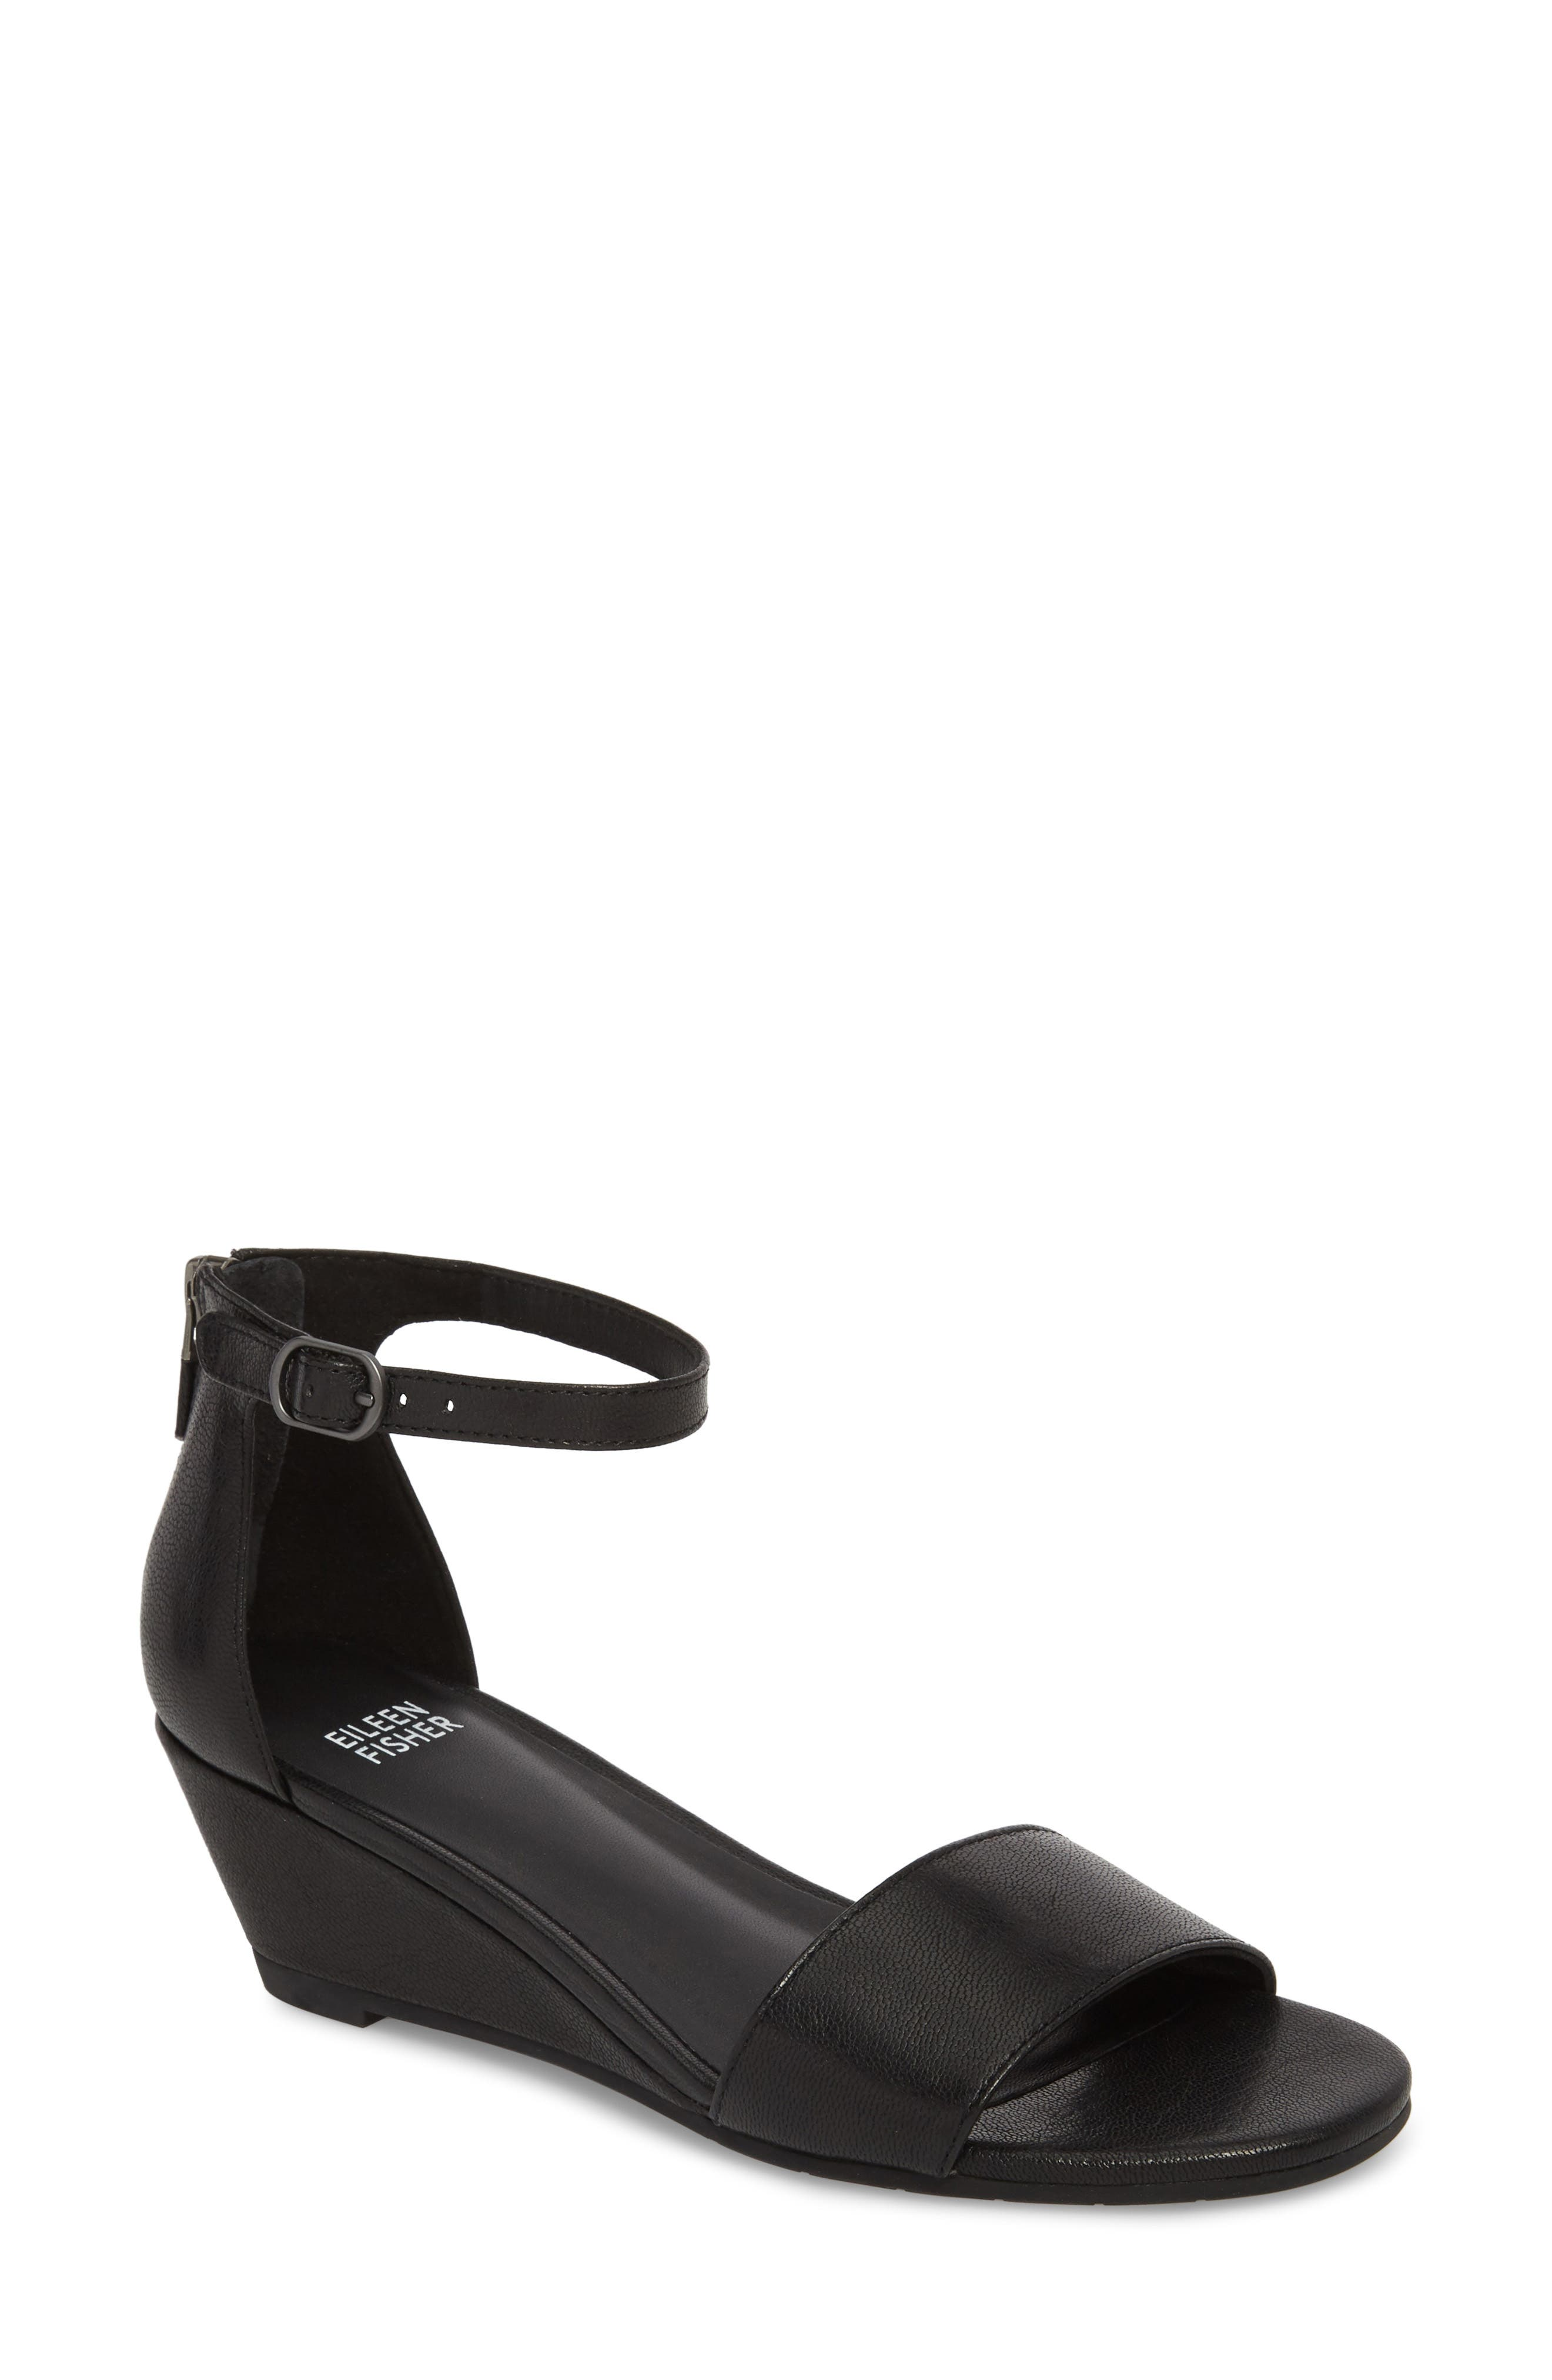 Mara Ankle Strap Wedge Sandal,                         Main,                         color, Black Leather